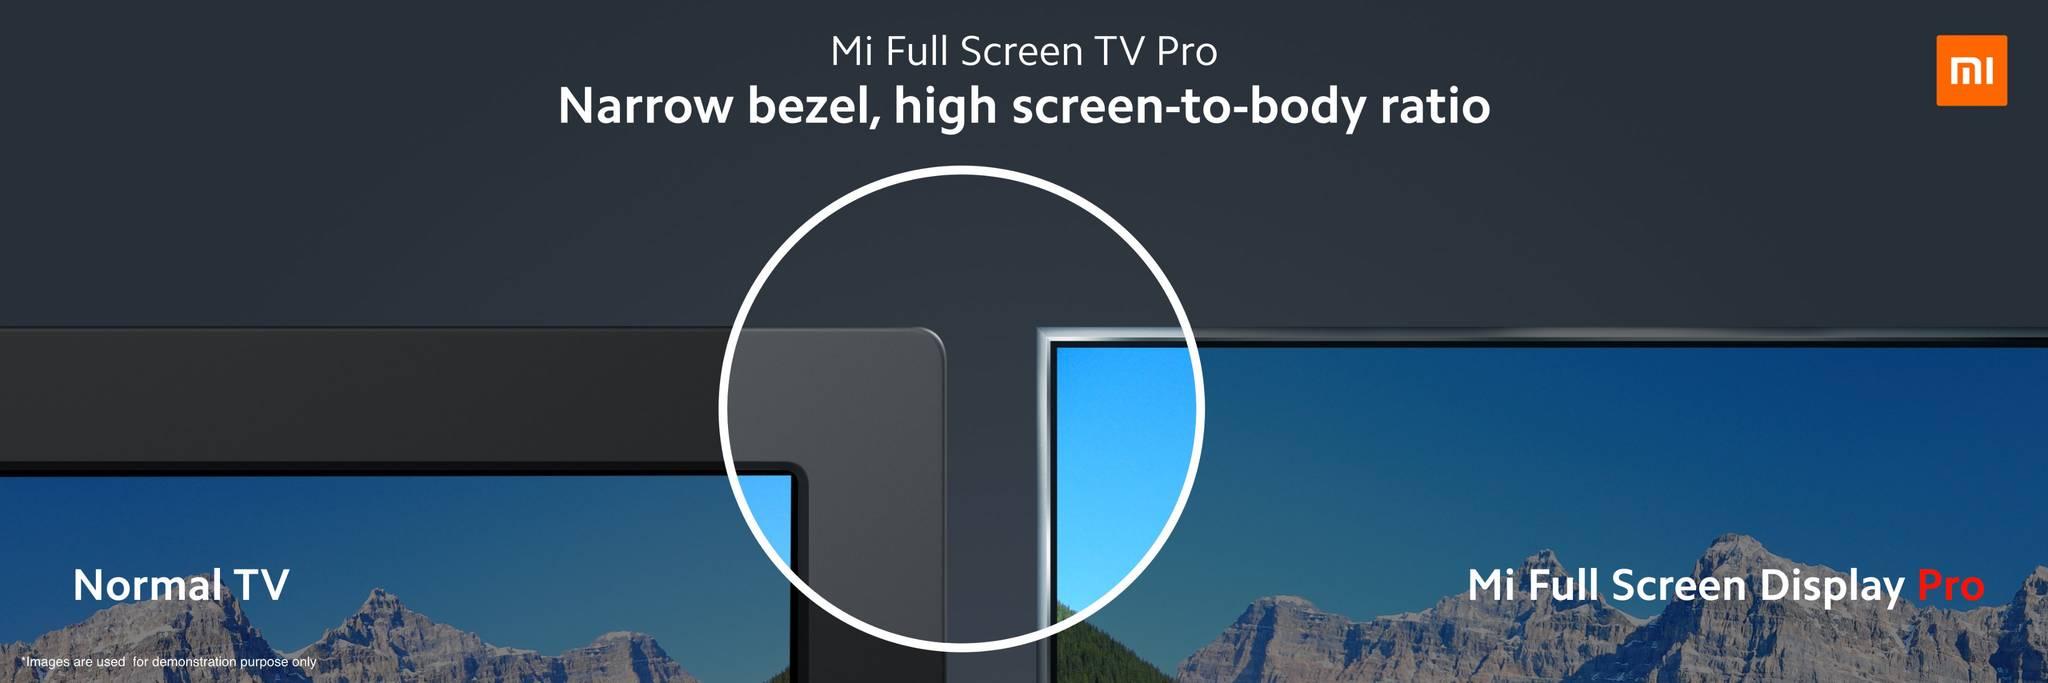 xiaomi_mi_full_screen_tv_pro